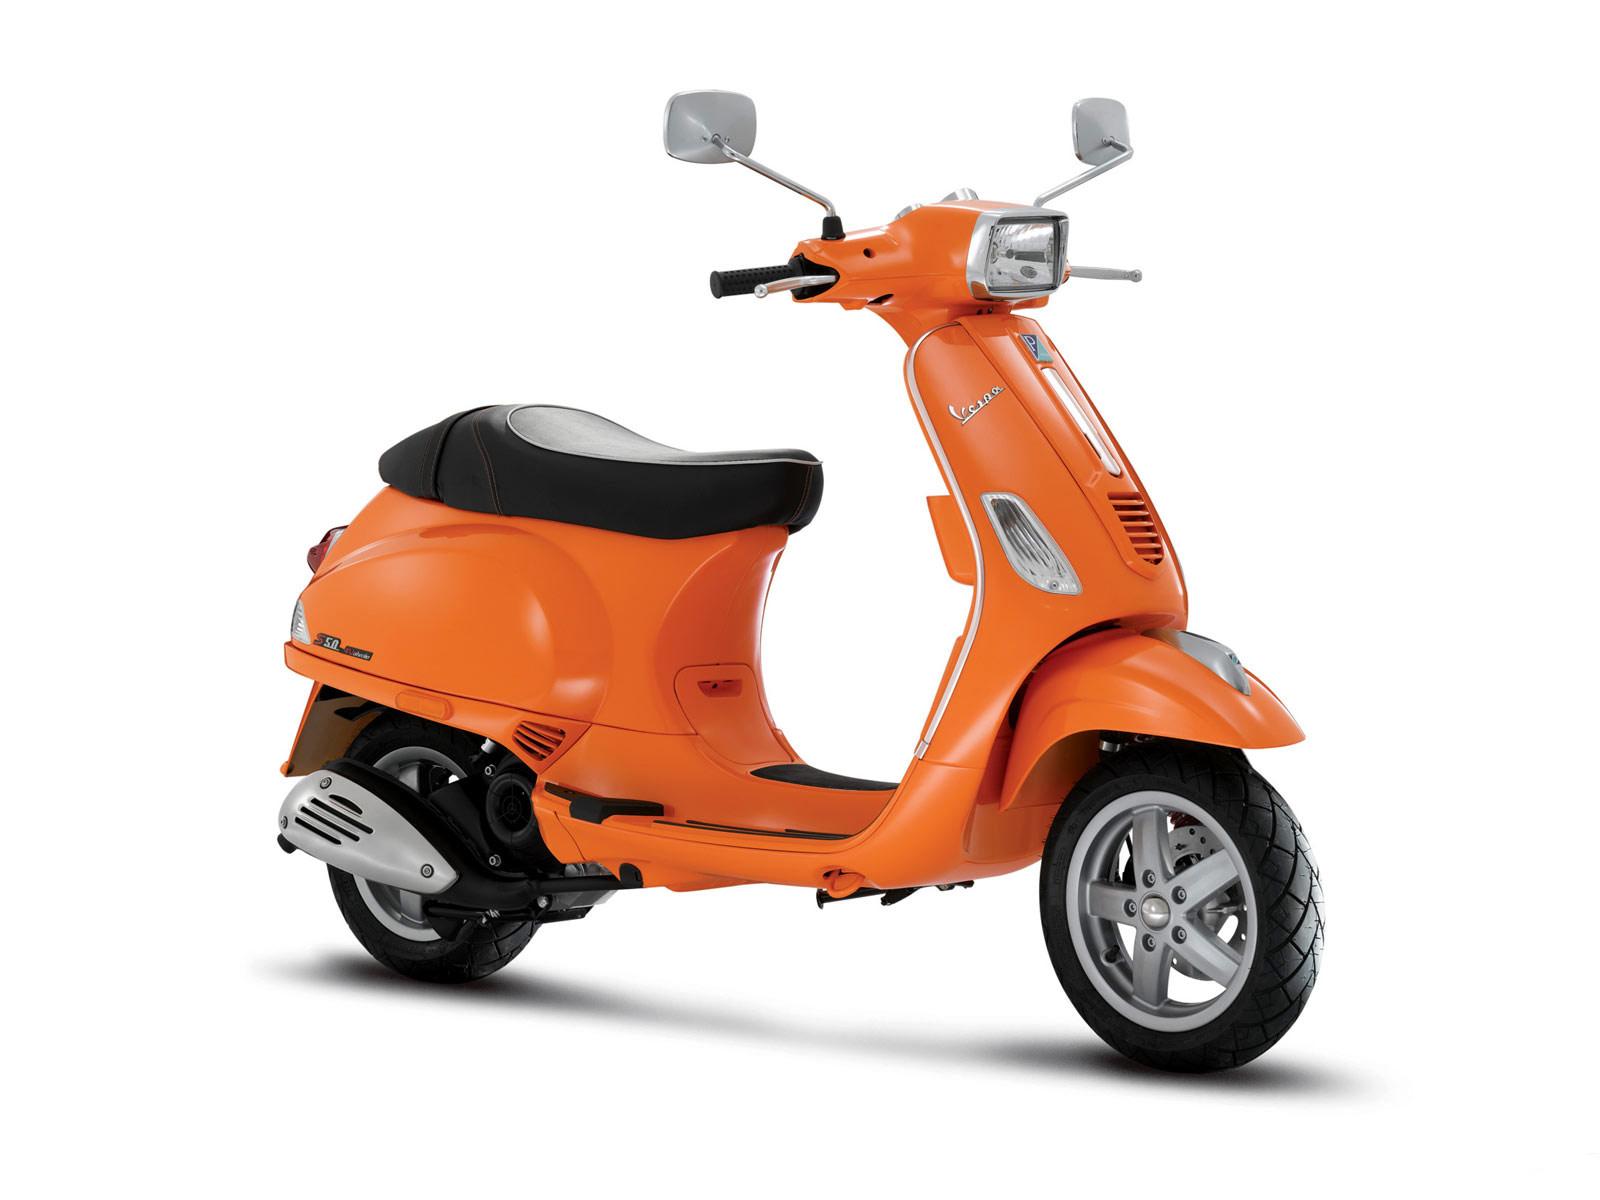 Accident lawyers information. 2008 VESPA S 50 4V scooter ...